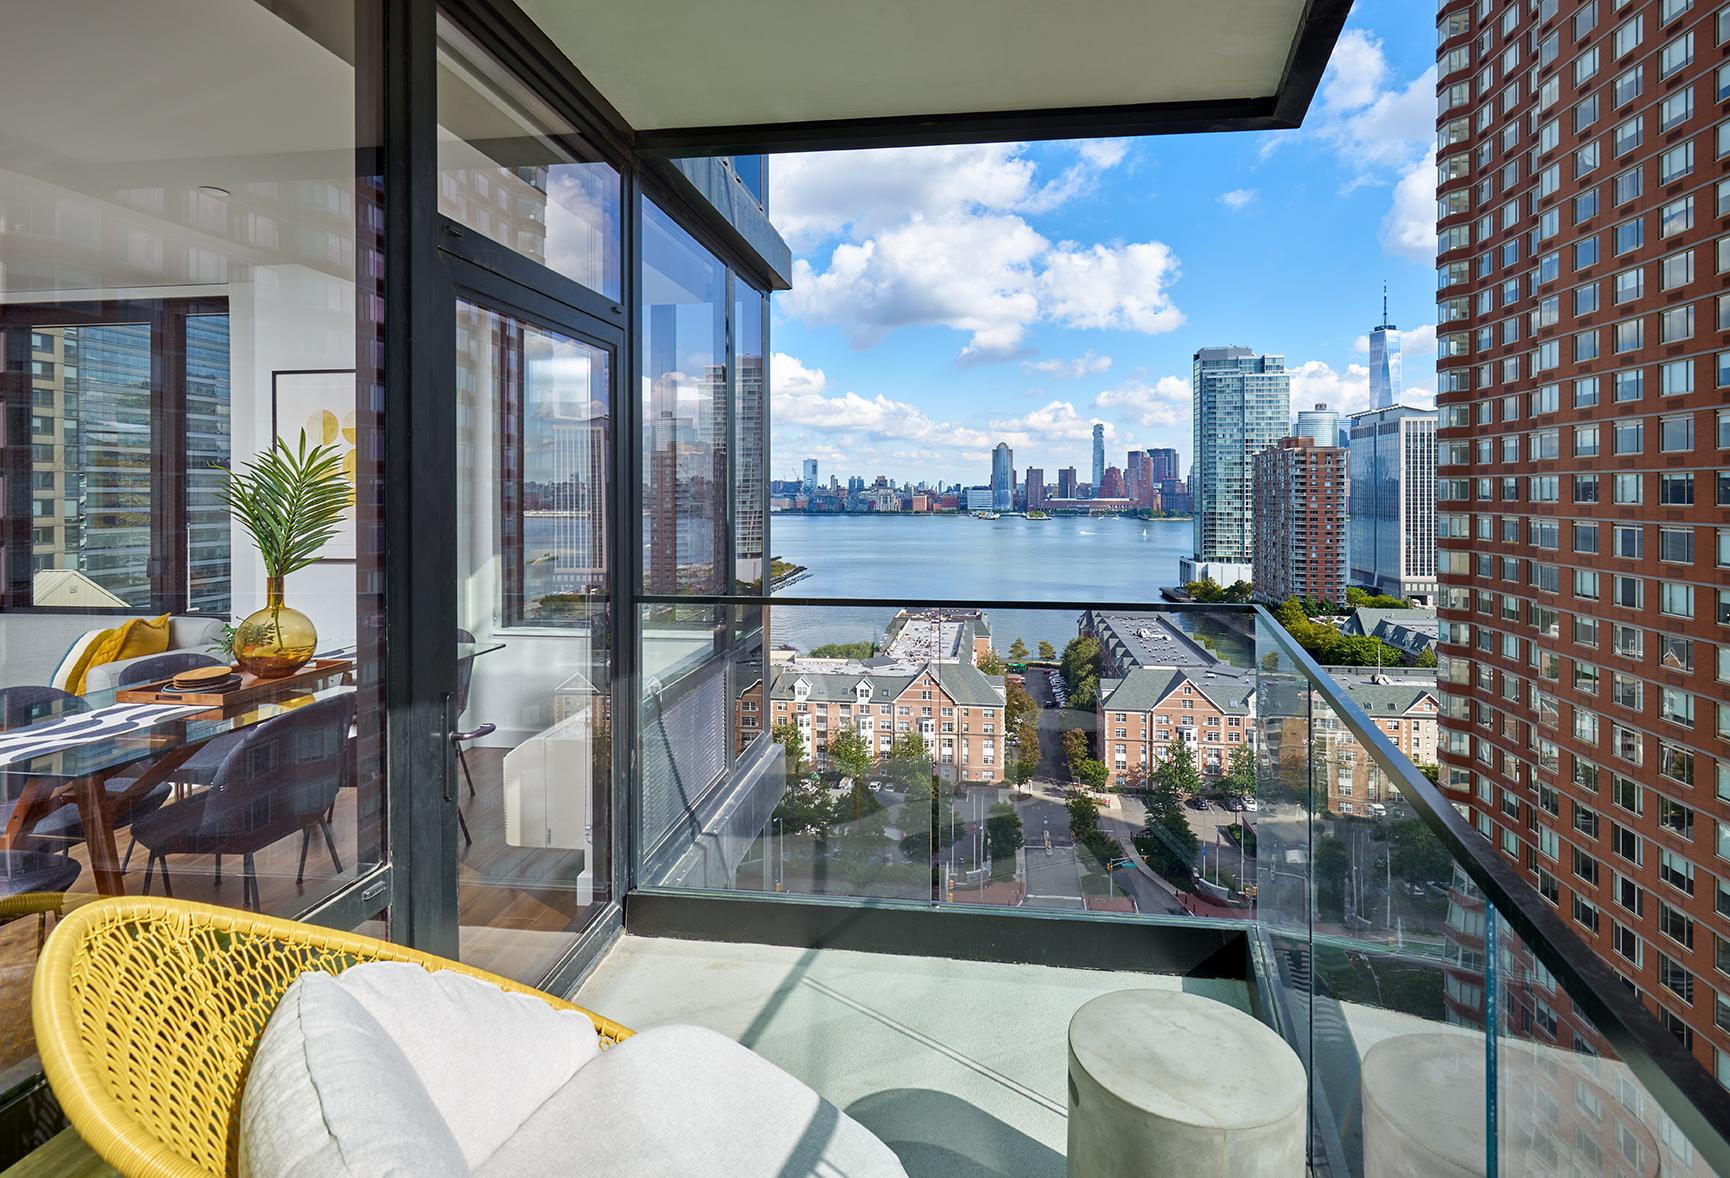 Balcony of a modern apartment unit